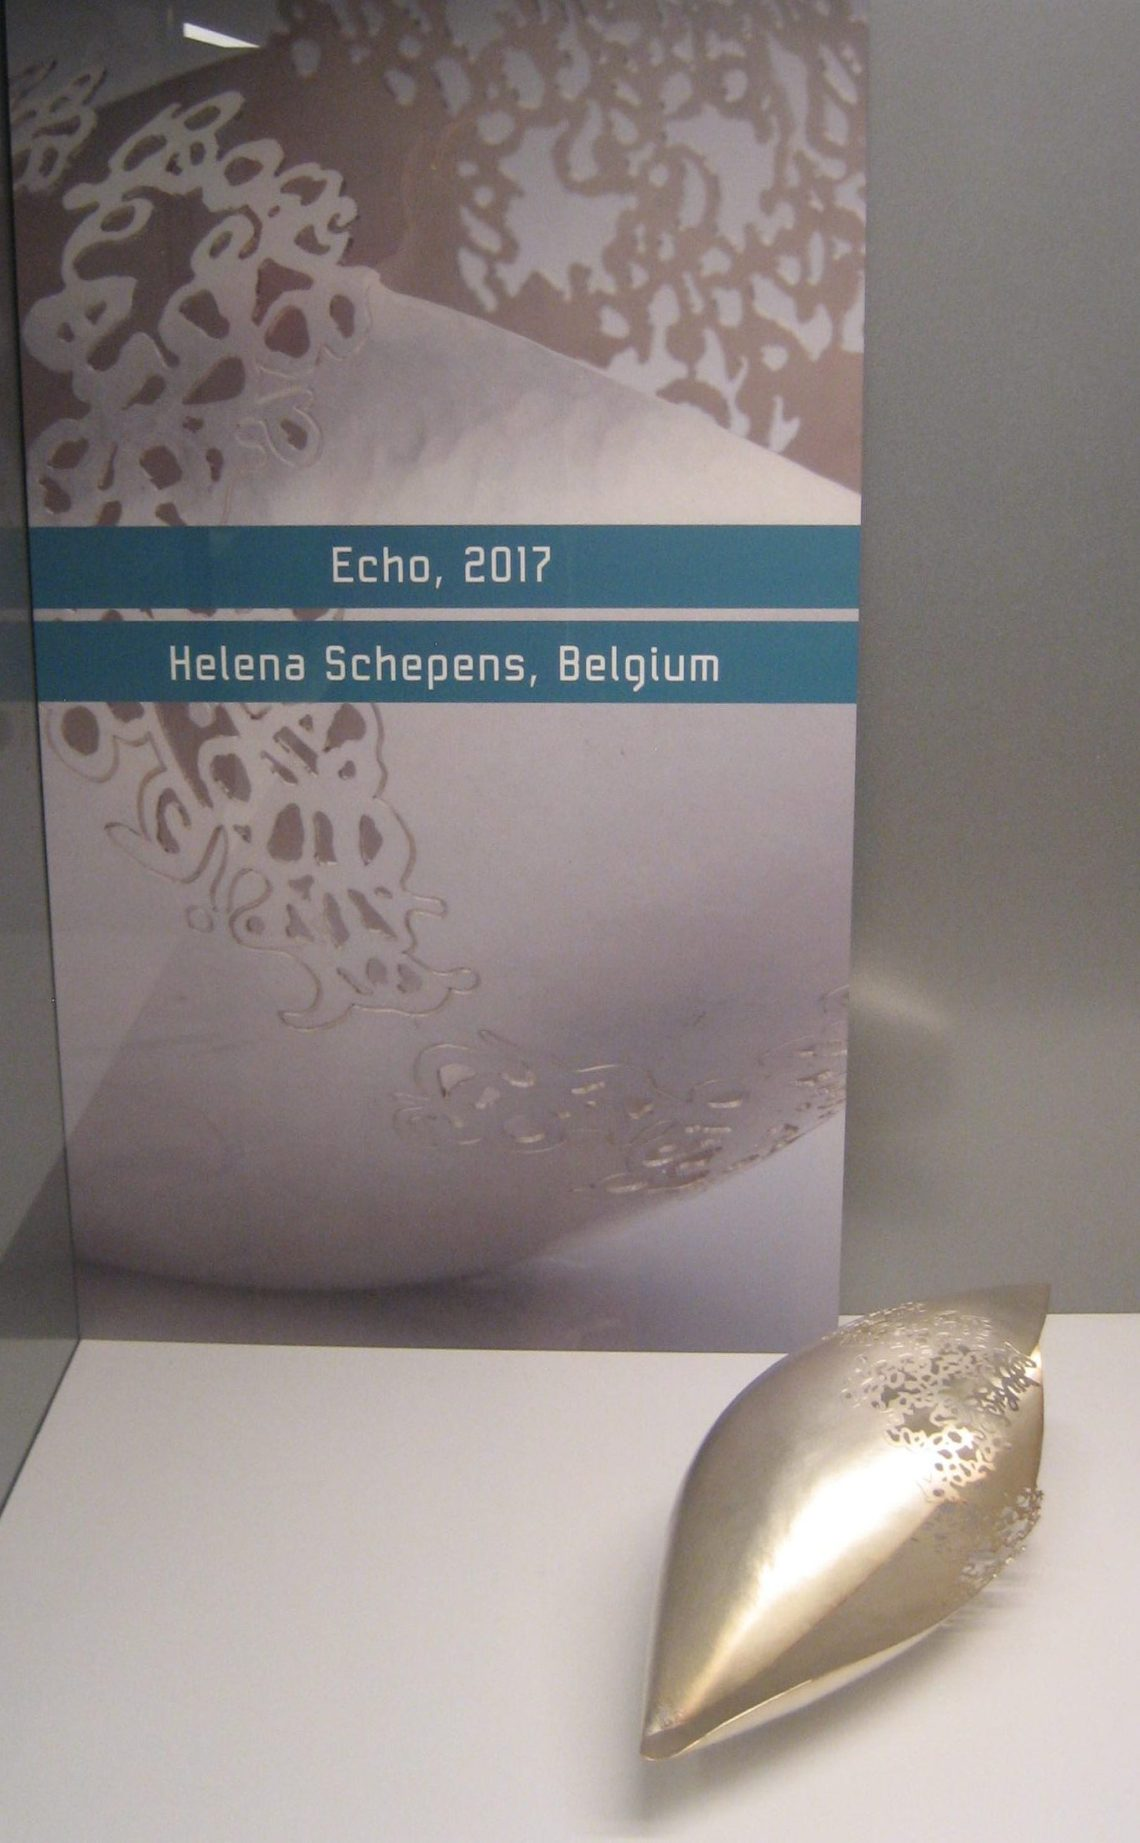 Helena Schepens, Echo, 2017. Foto Esther Doornbusch, 29 maart 2019, CC BY 4.0